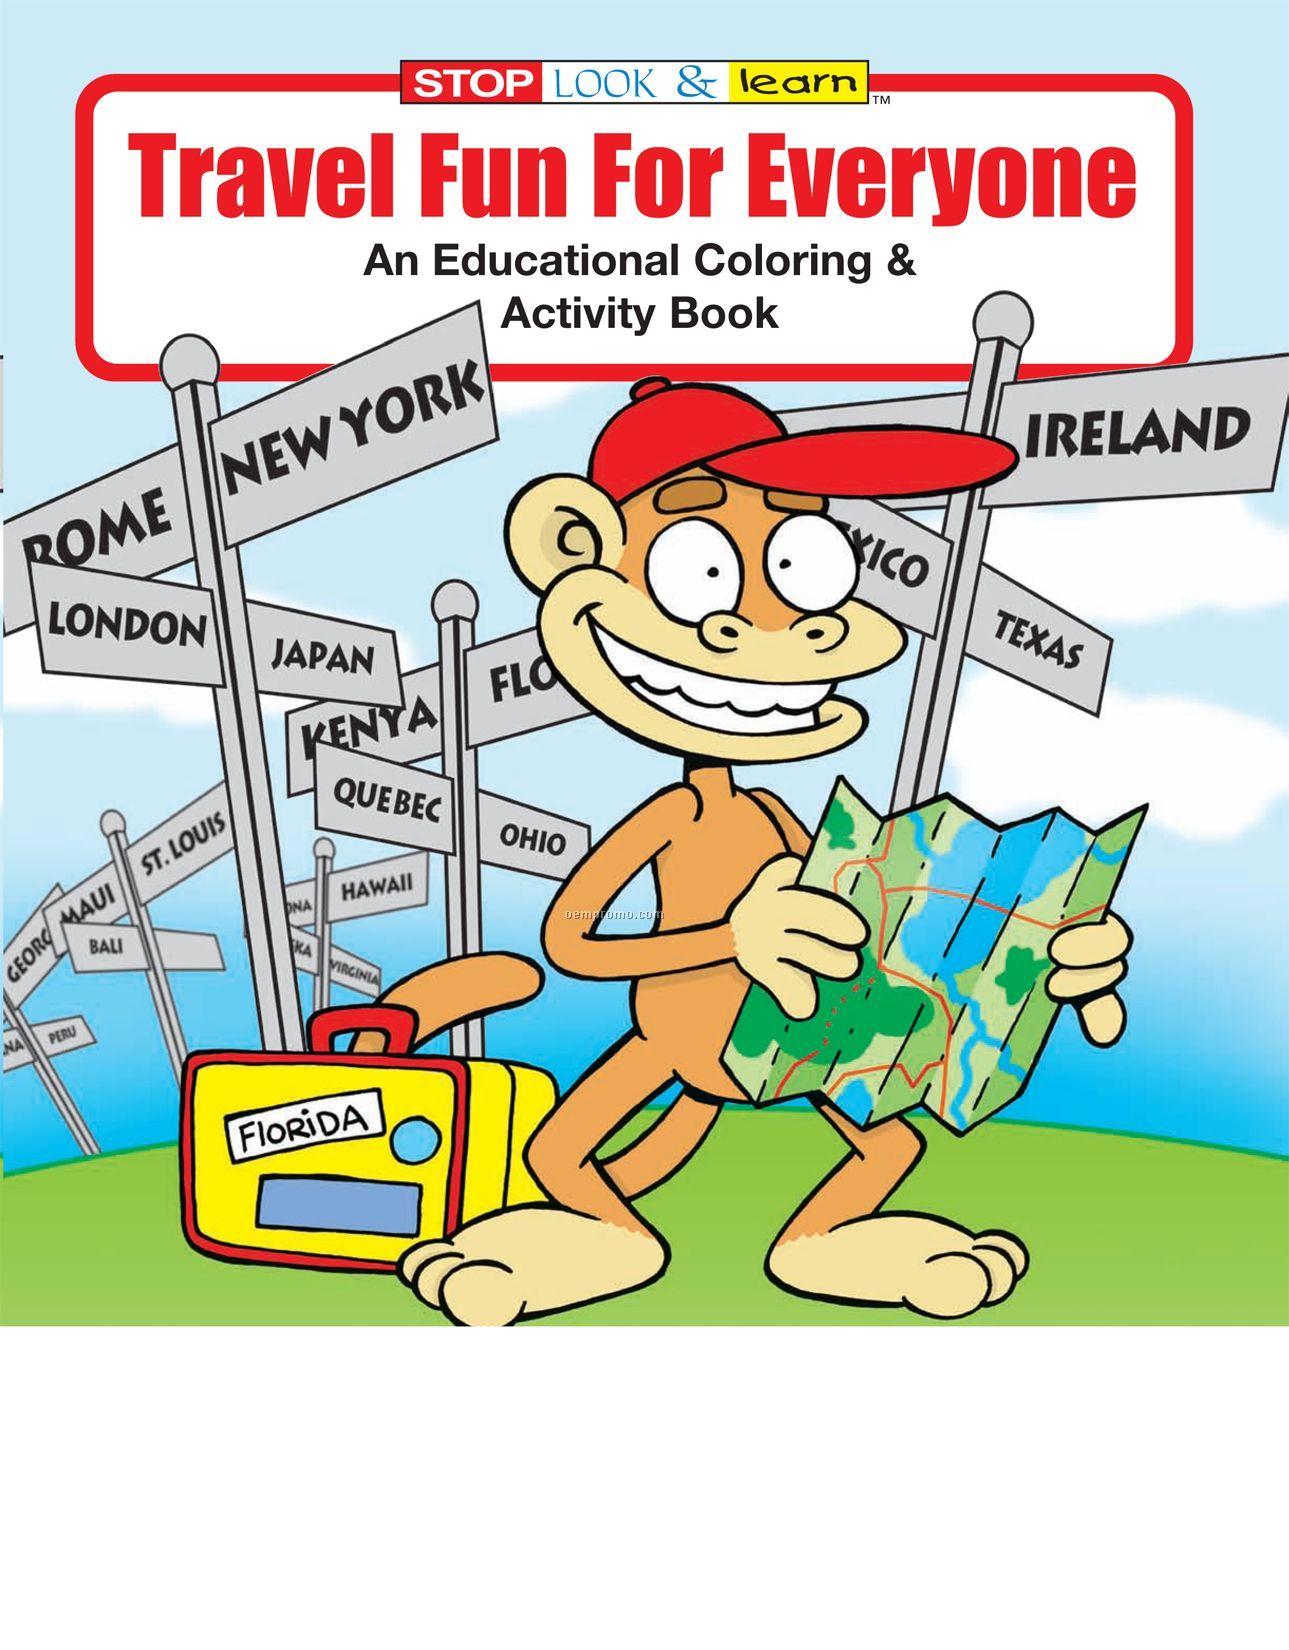 Travel Fun For Everyone Coloring Book